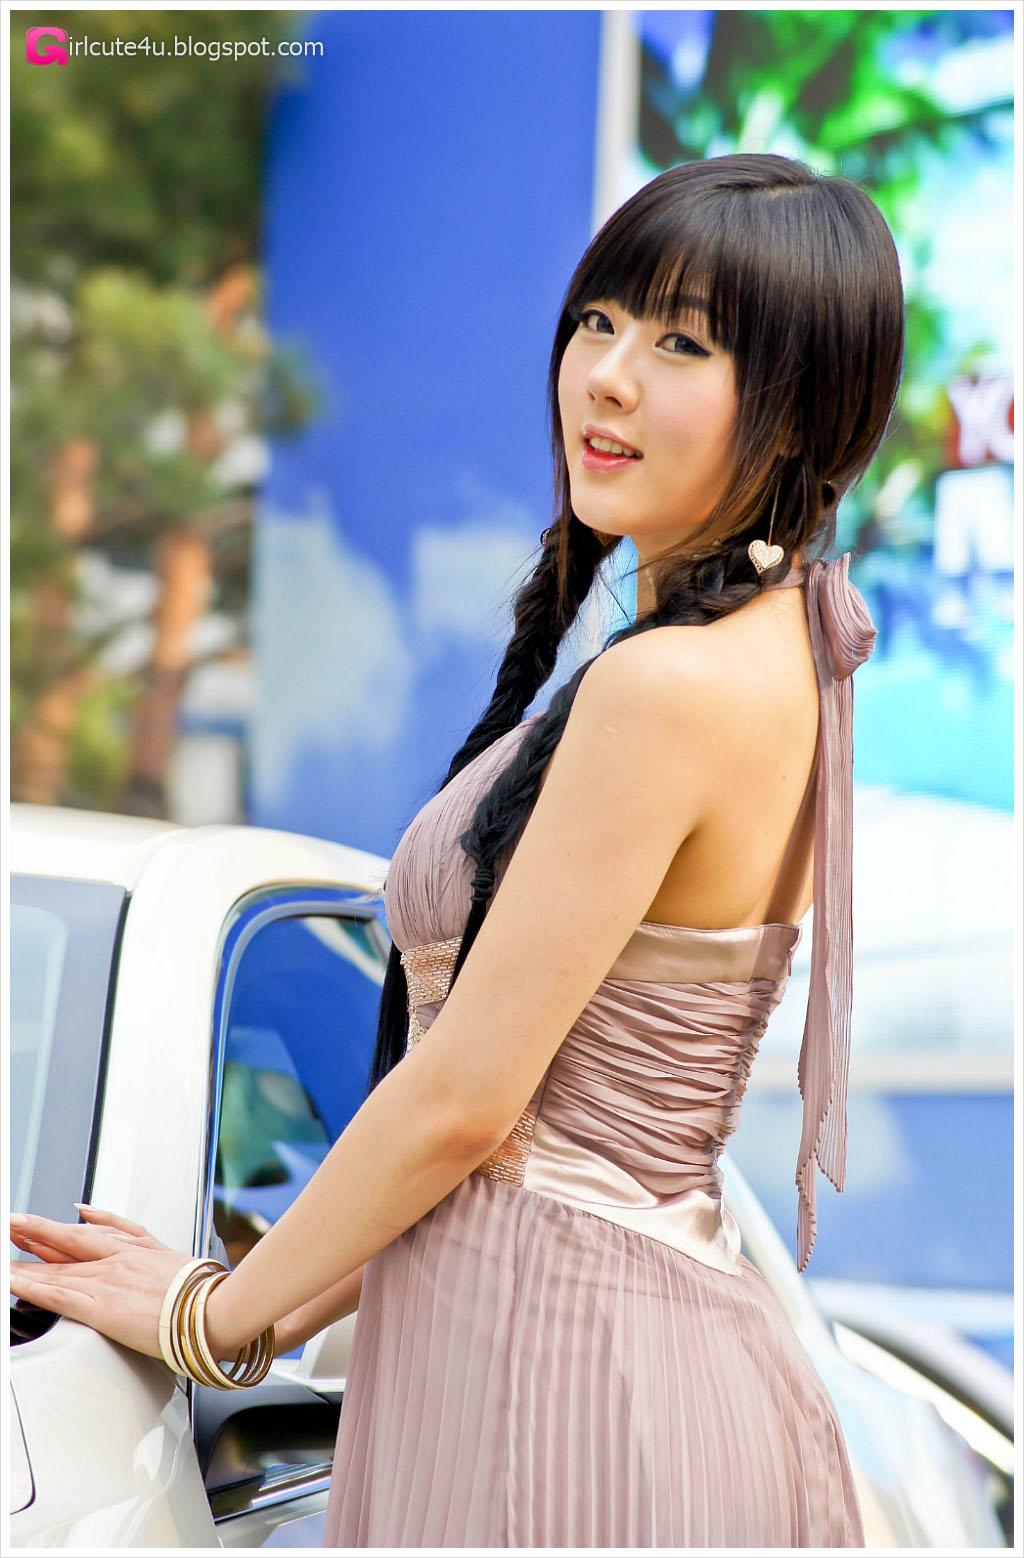 xxx nude girls: Hwang Mi Hee at Chevrolet Exhibitions